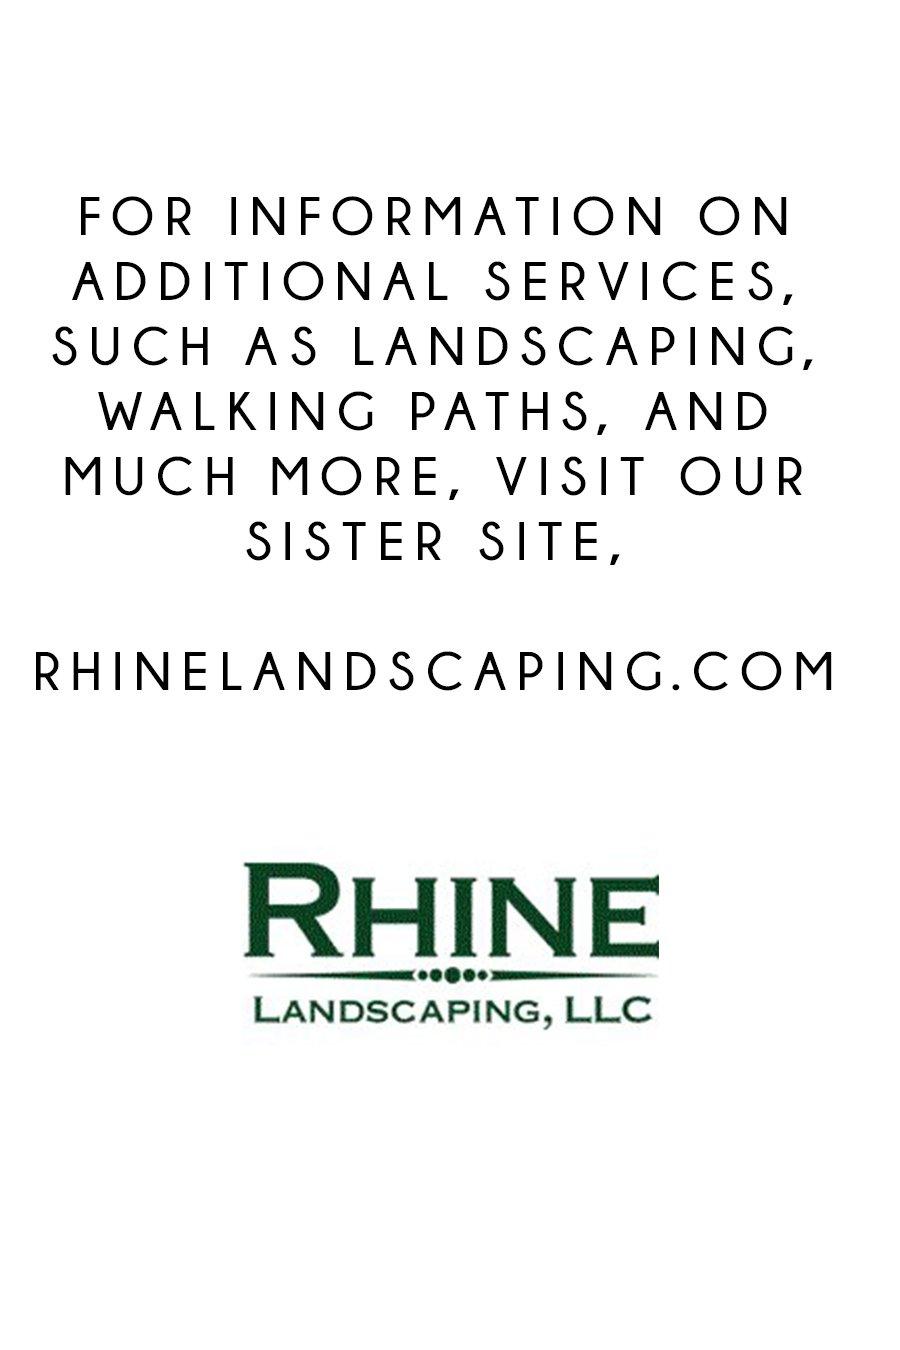 rhine landscaping